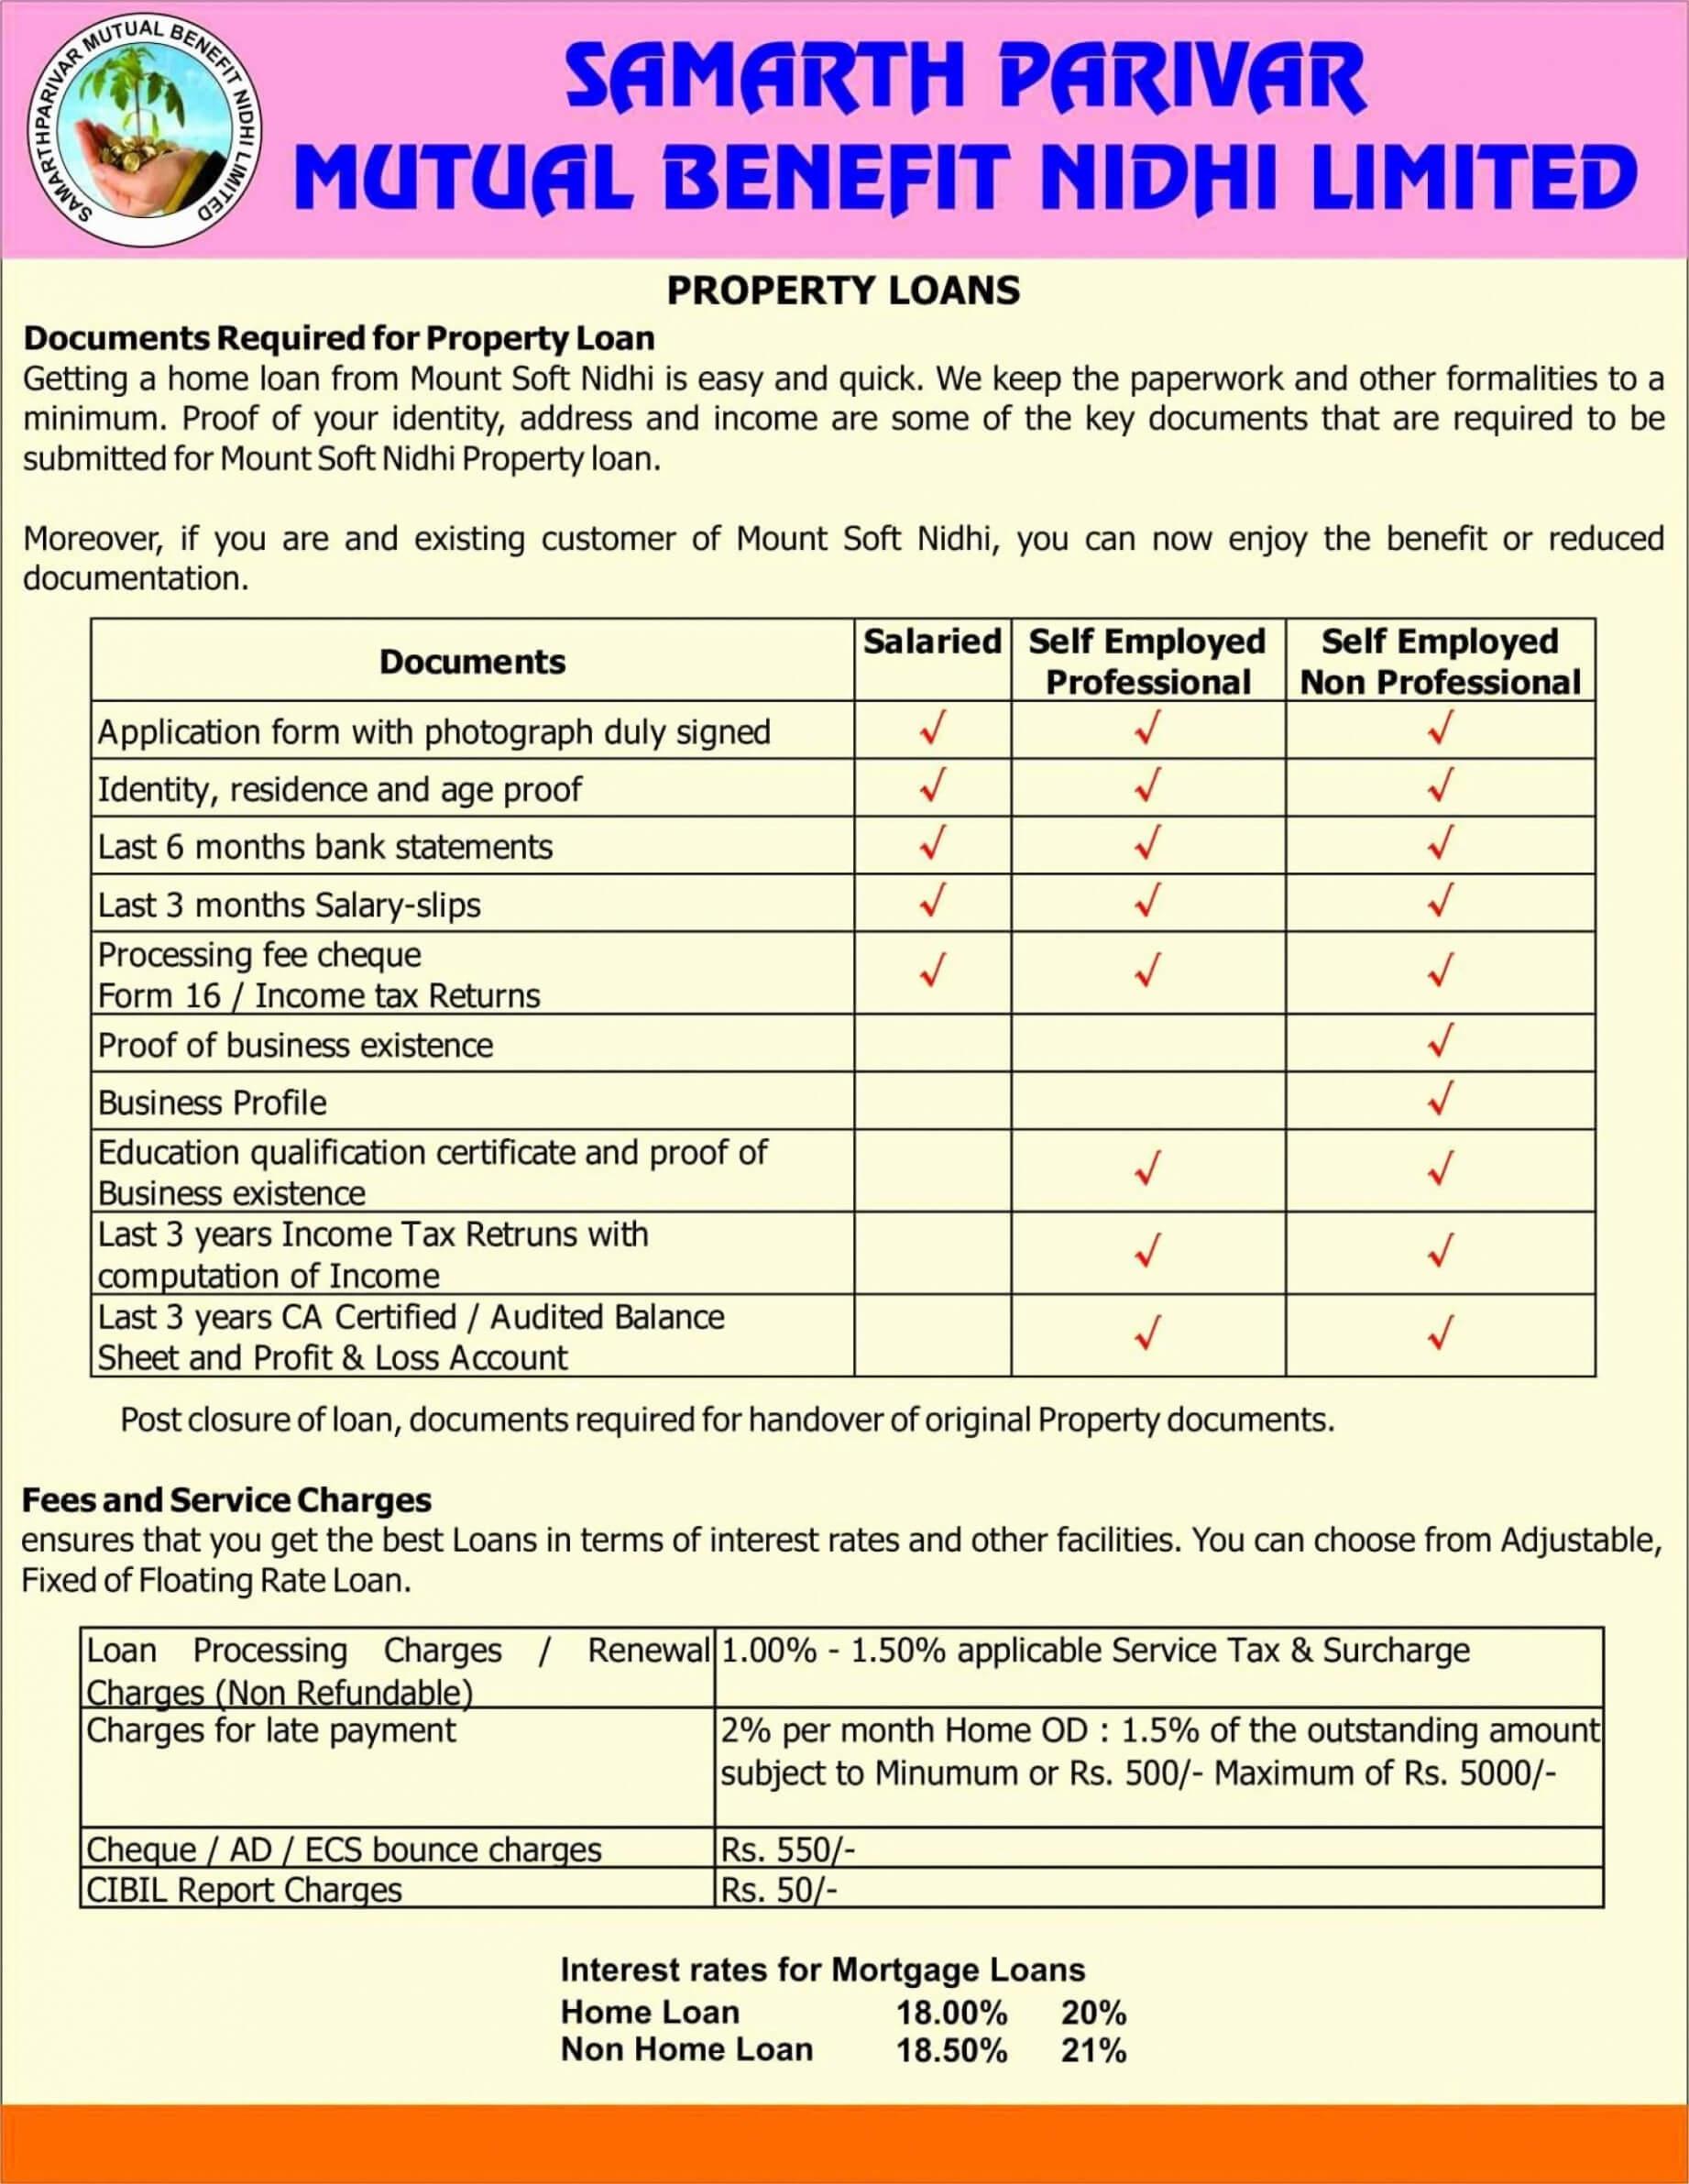 Birth Certificate Template Google Docs - Climatejourney inside Novelty Birth Certificate Template